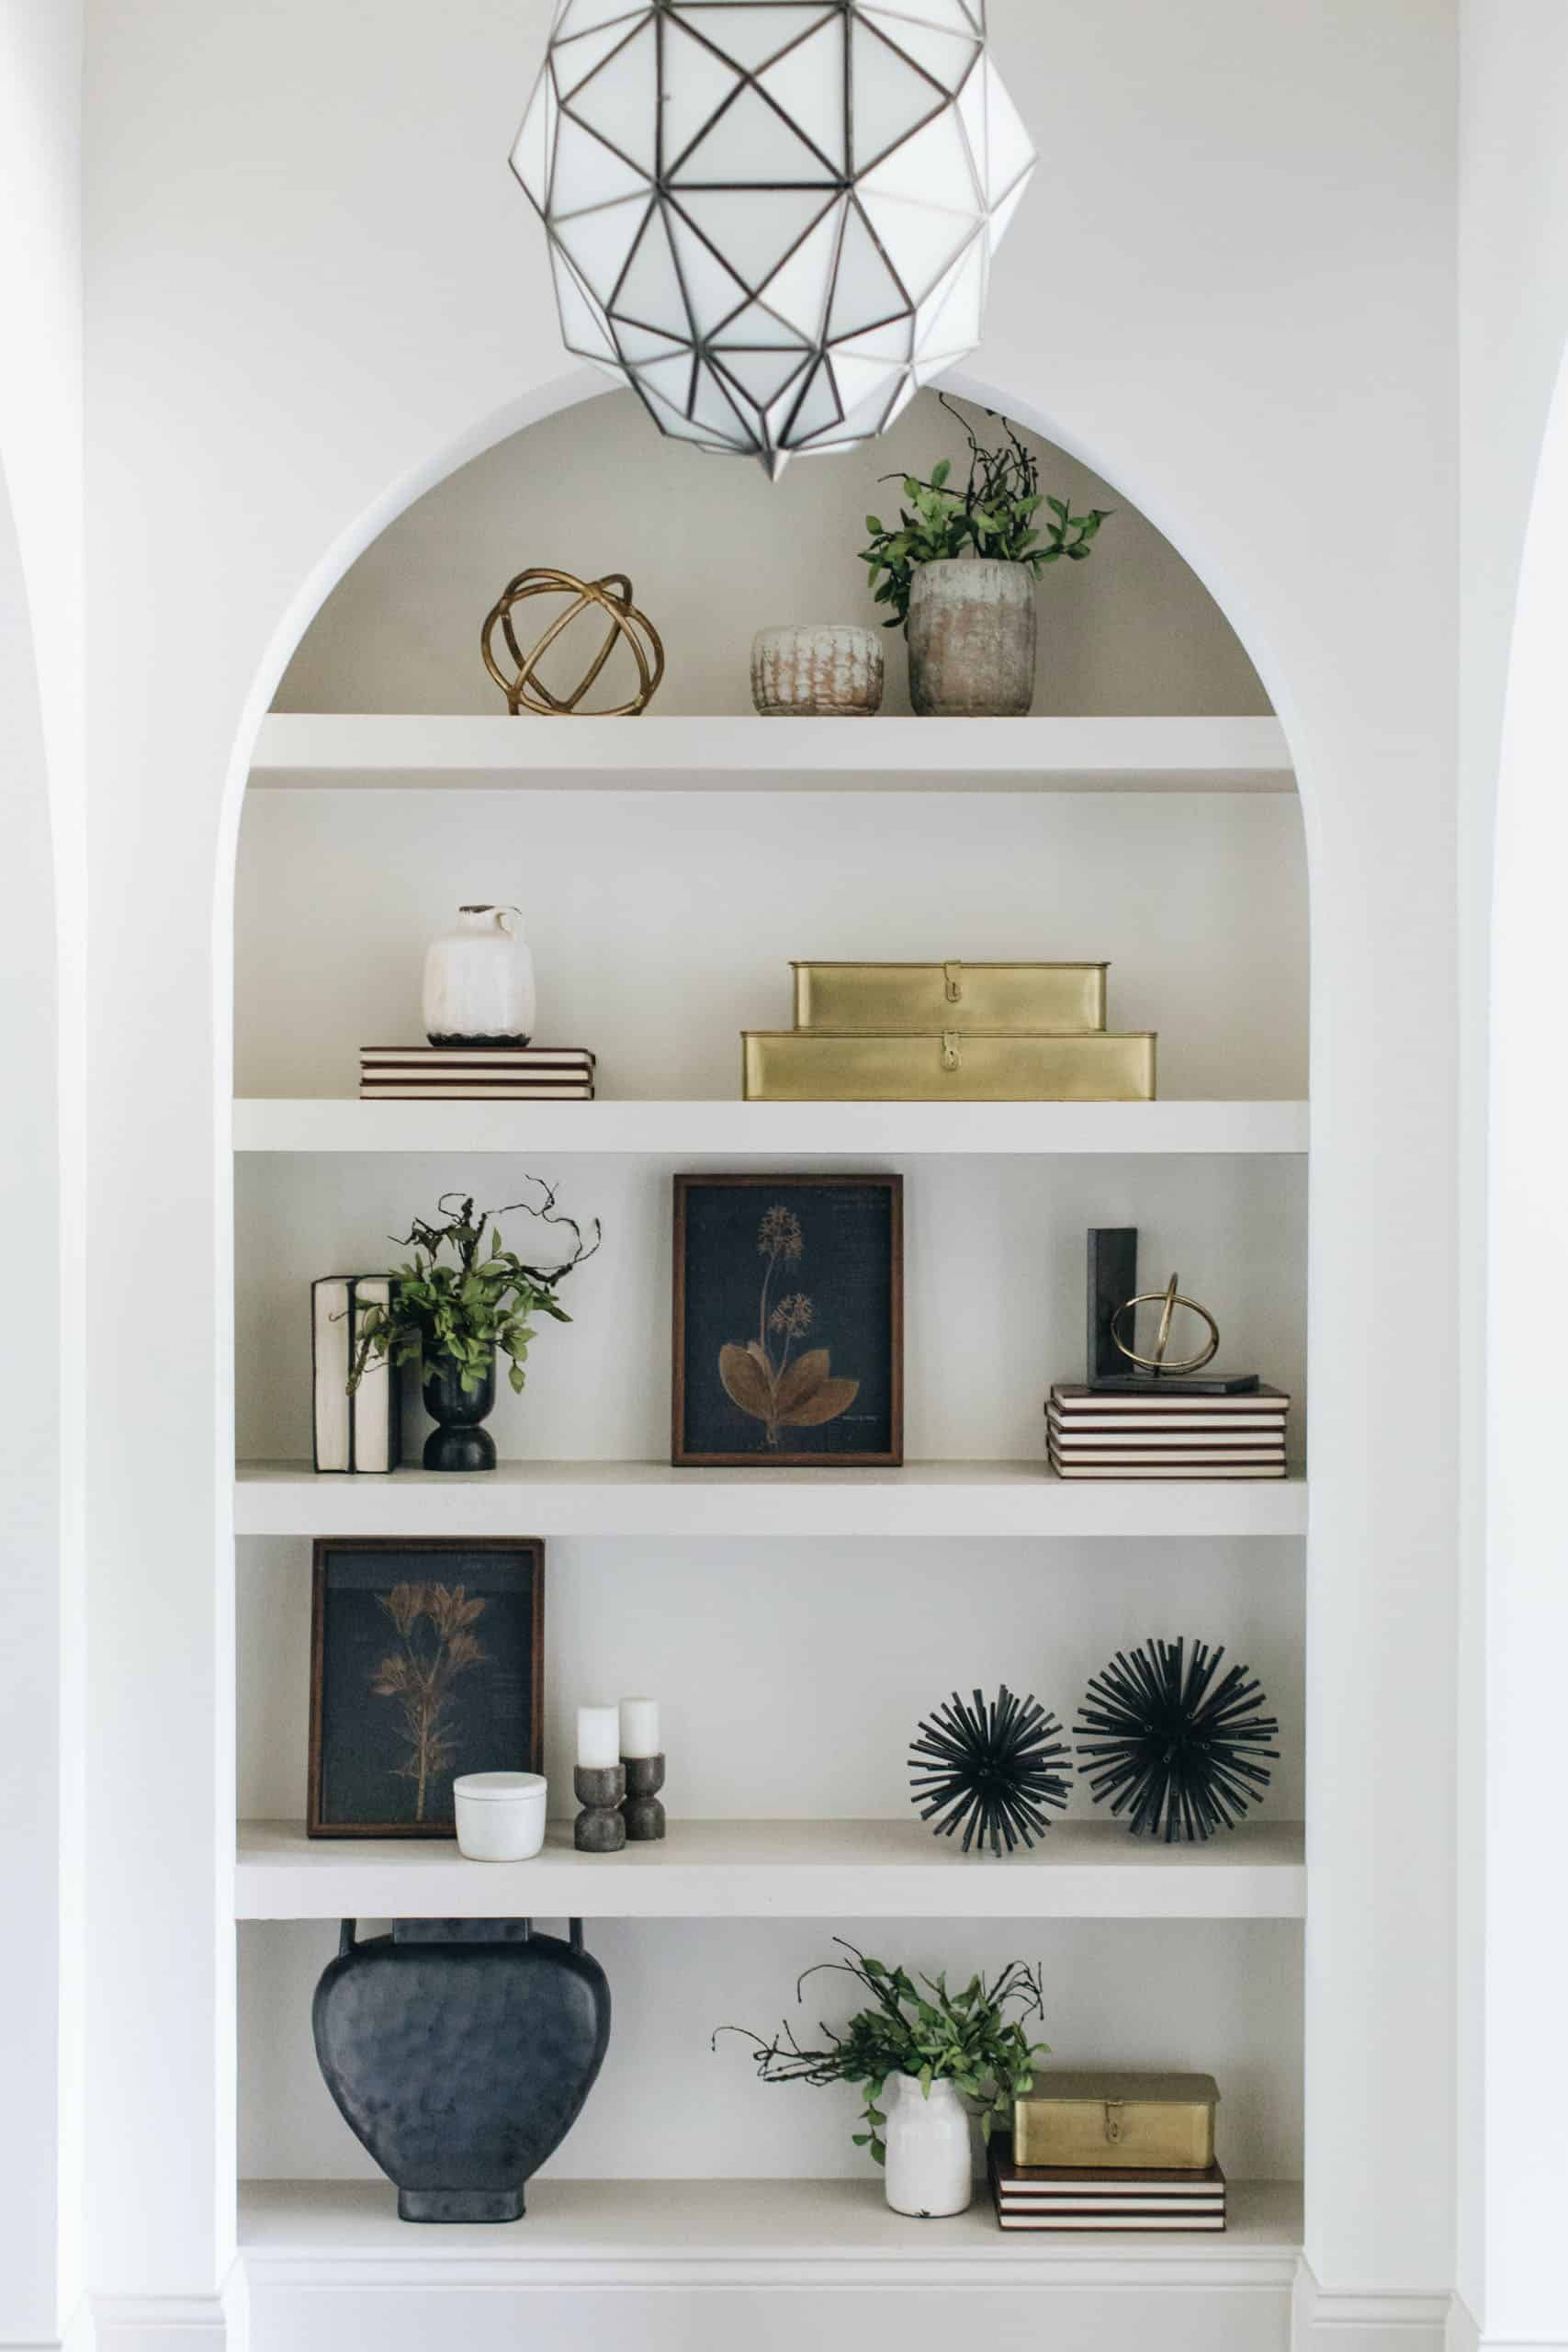 transitional-style-hallway-bookshelf-display